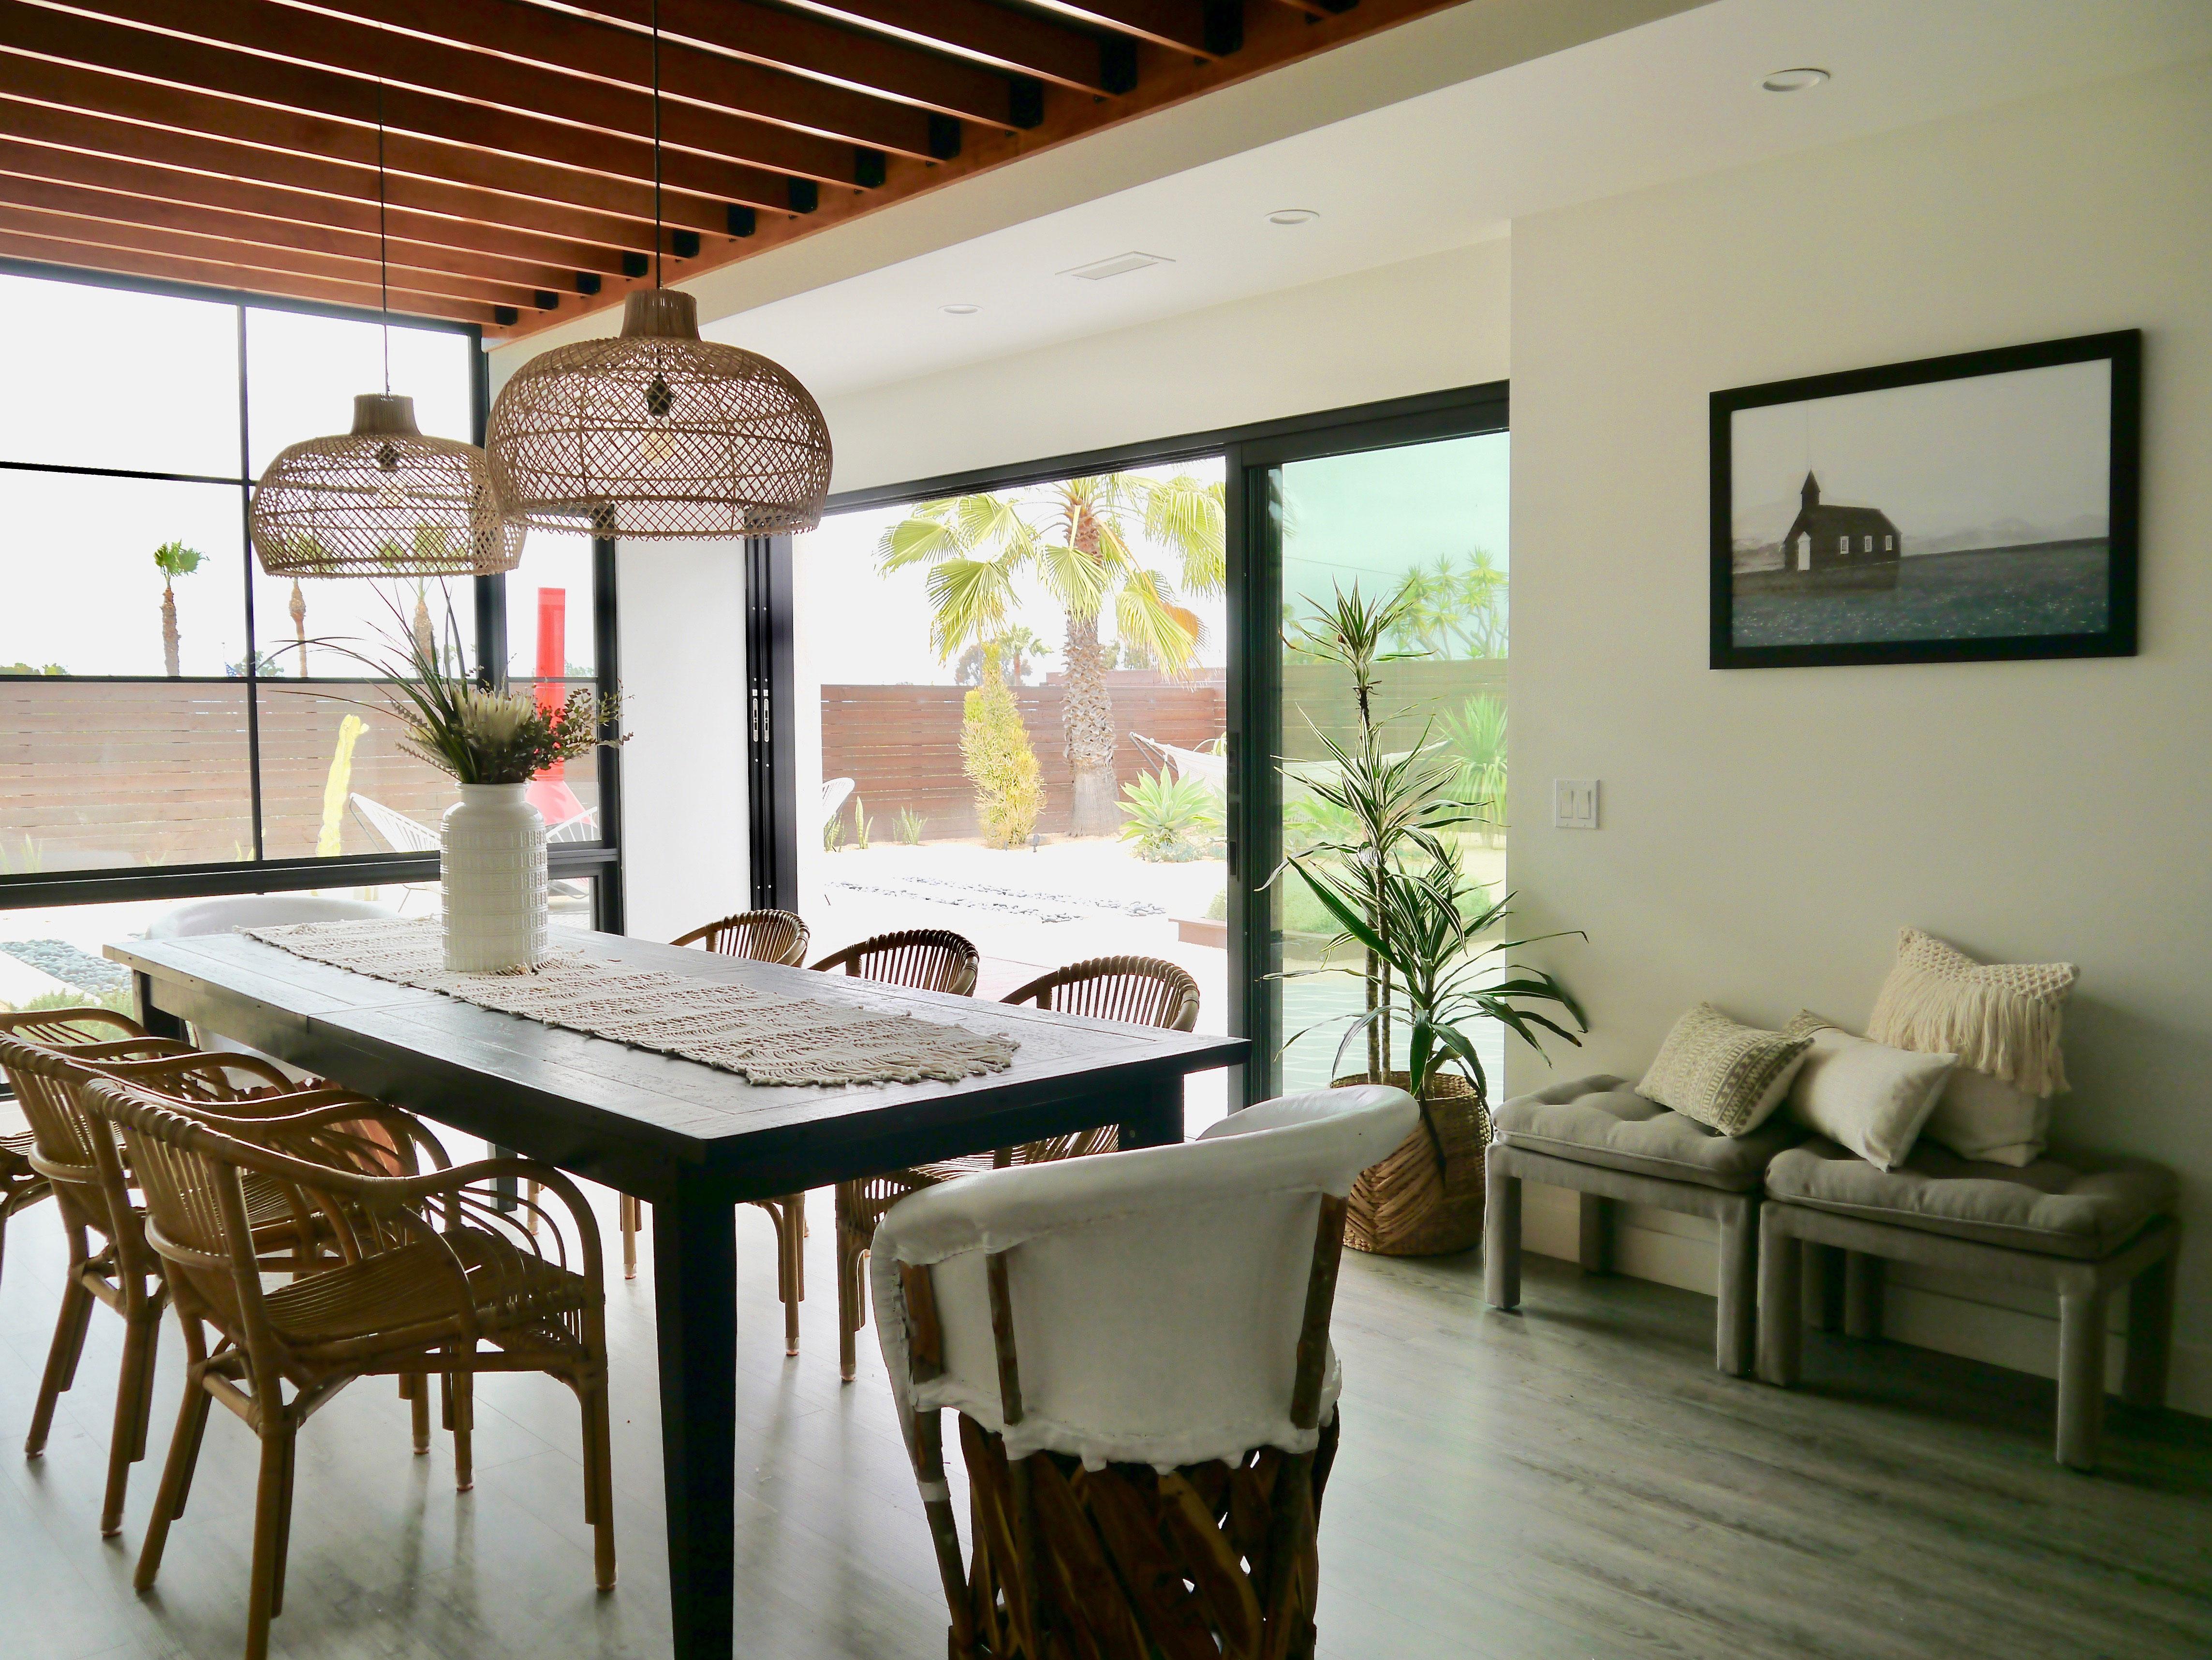 abbie naber shop your home zero budget redecorate